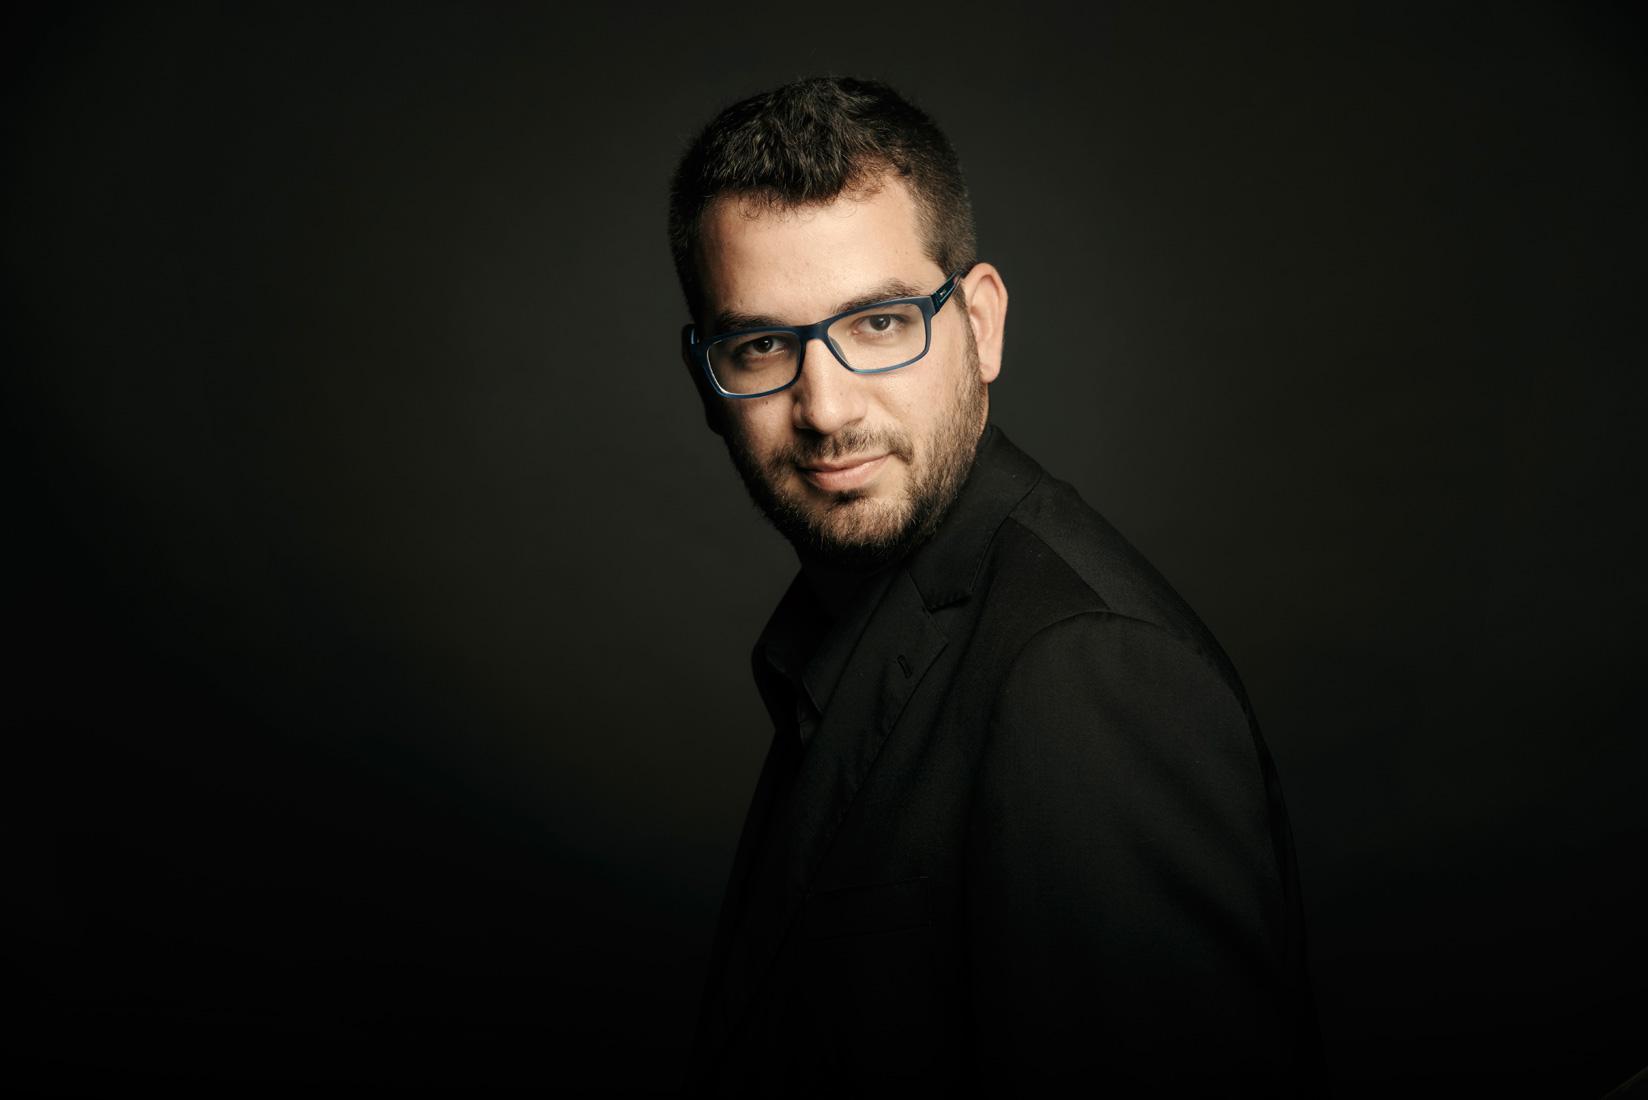 Joaquín Arrabal